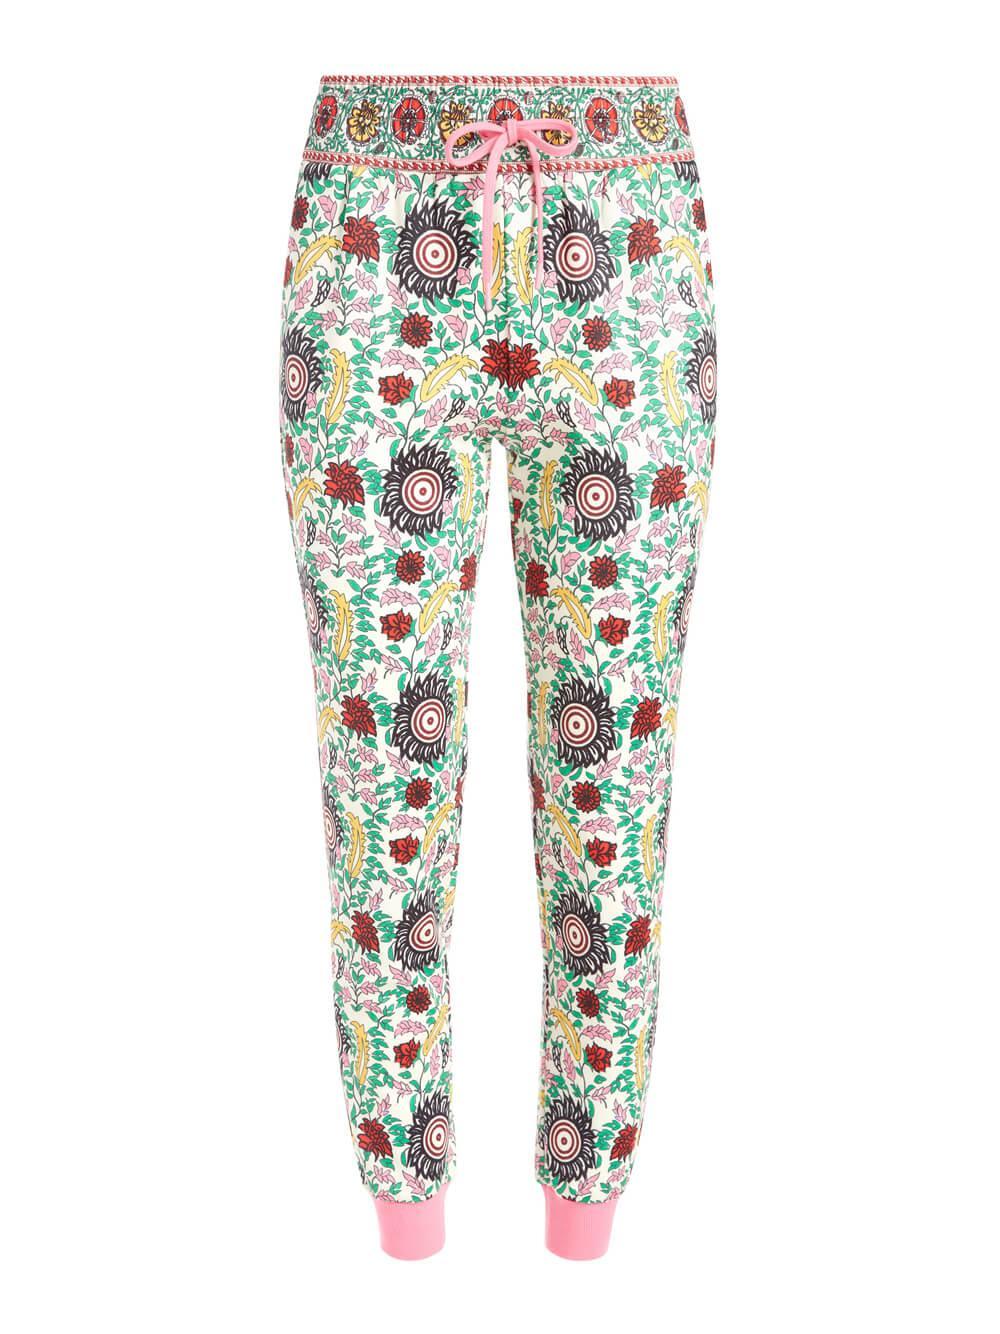 Nyc Slim Floral Jogger Item # CC102P58101